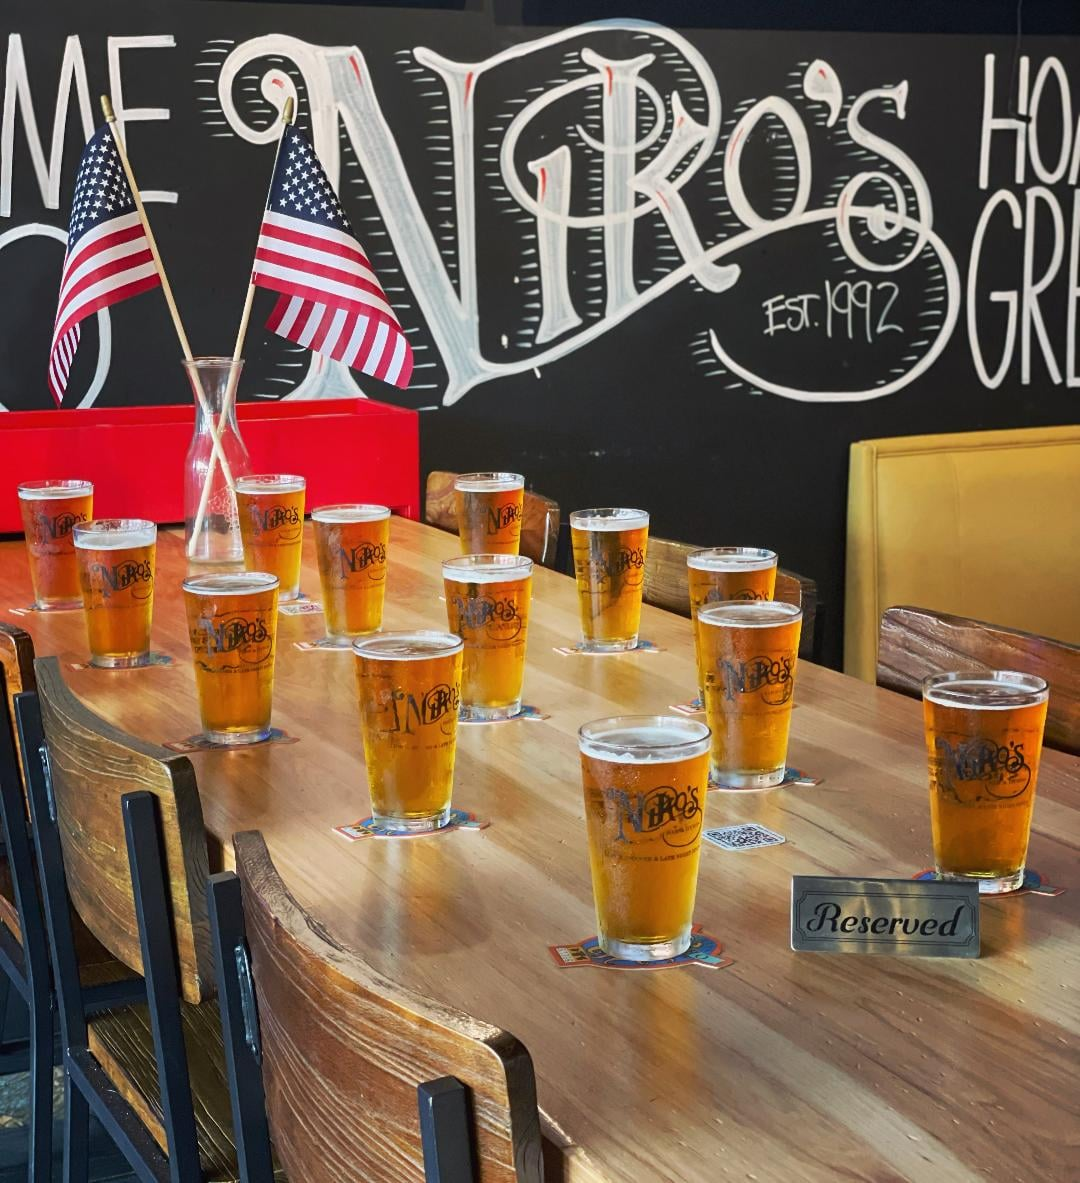 Niko's Bar and Gyros honoring Americans killed in Afghanistan